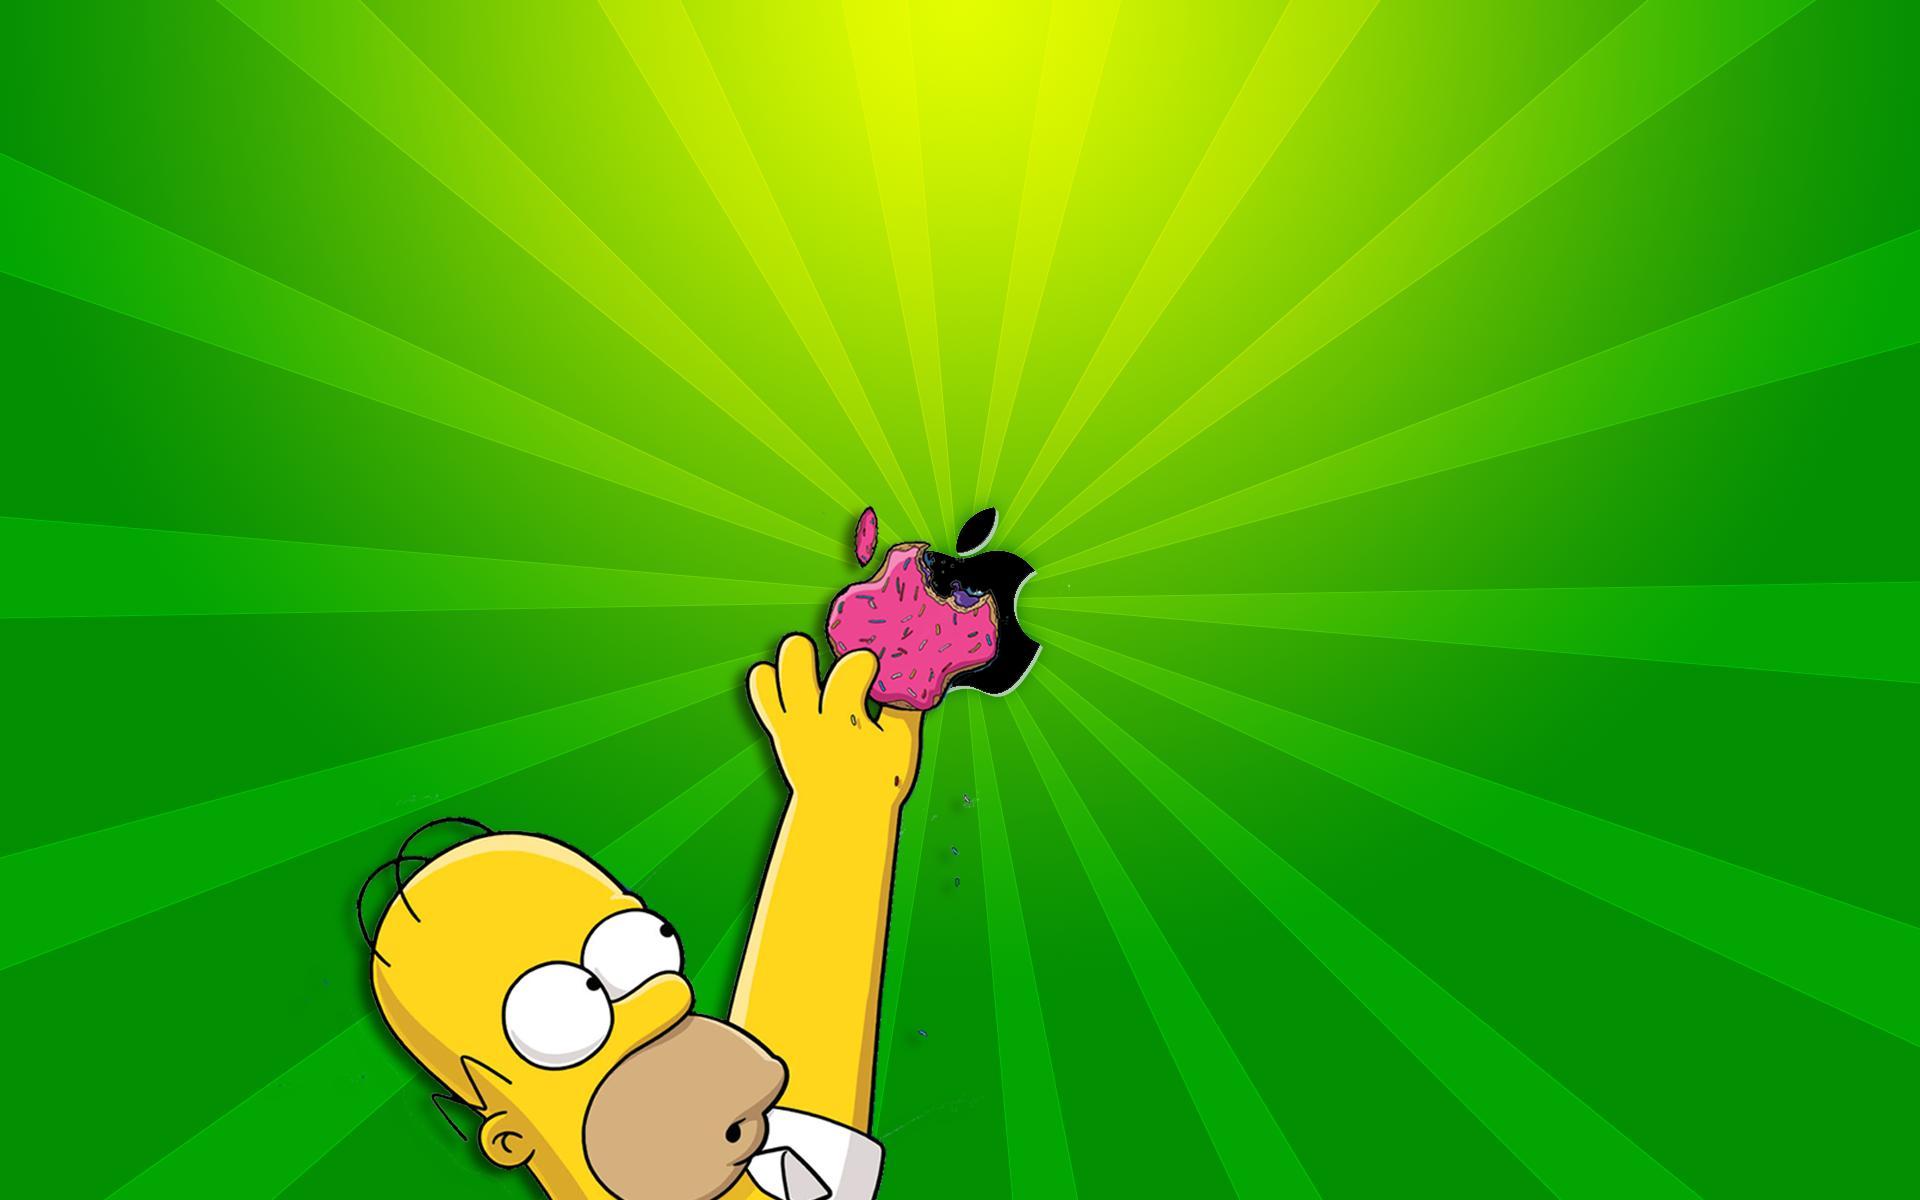 3d Live Wallpaper For Windows Xp Free Download Homer Simpson Apple Wallpaper Hd Desktop Wallpapers 4k Hd